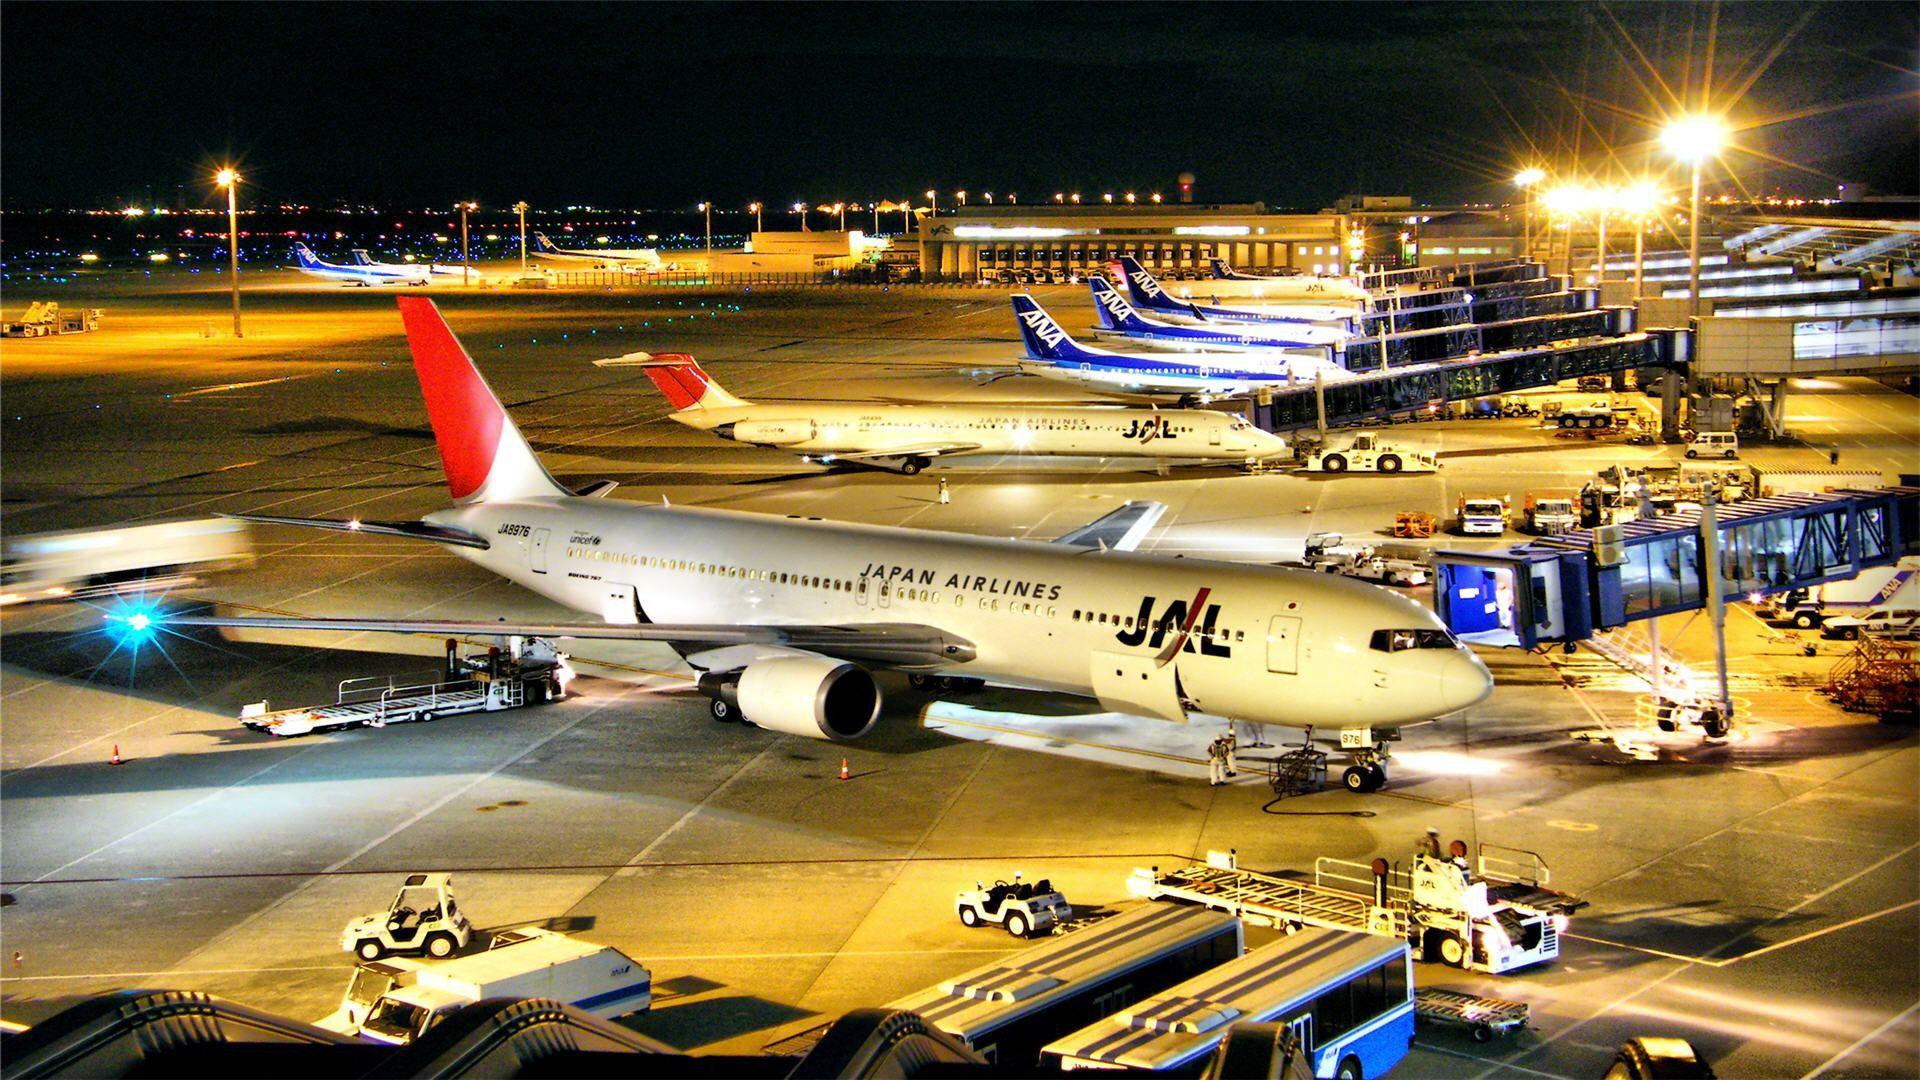 airport pics hd